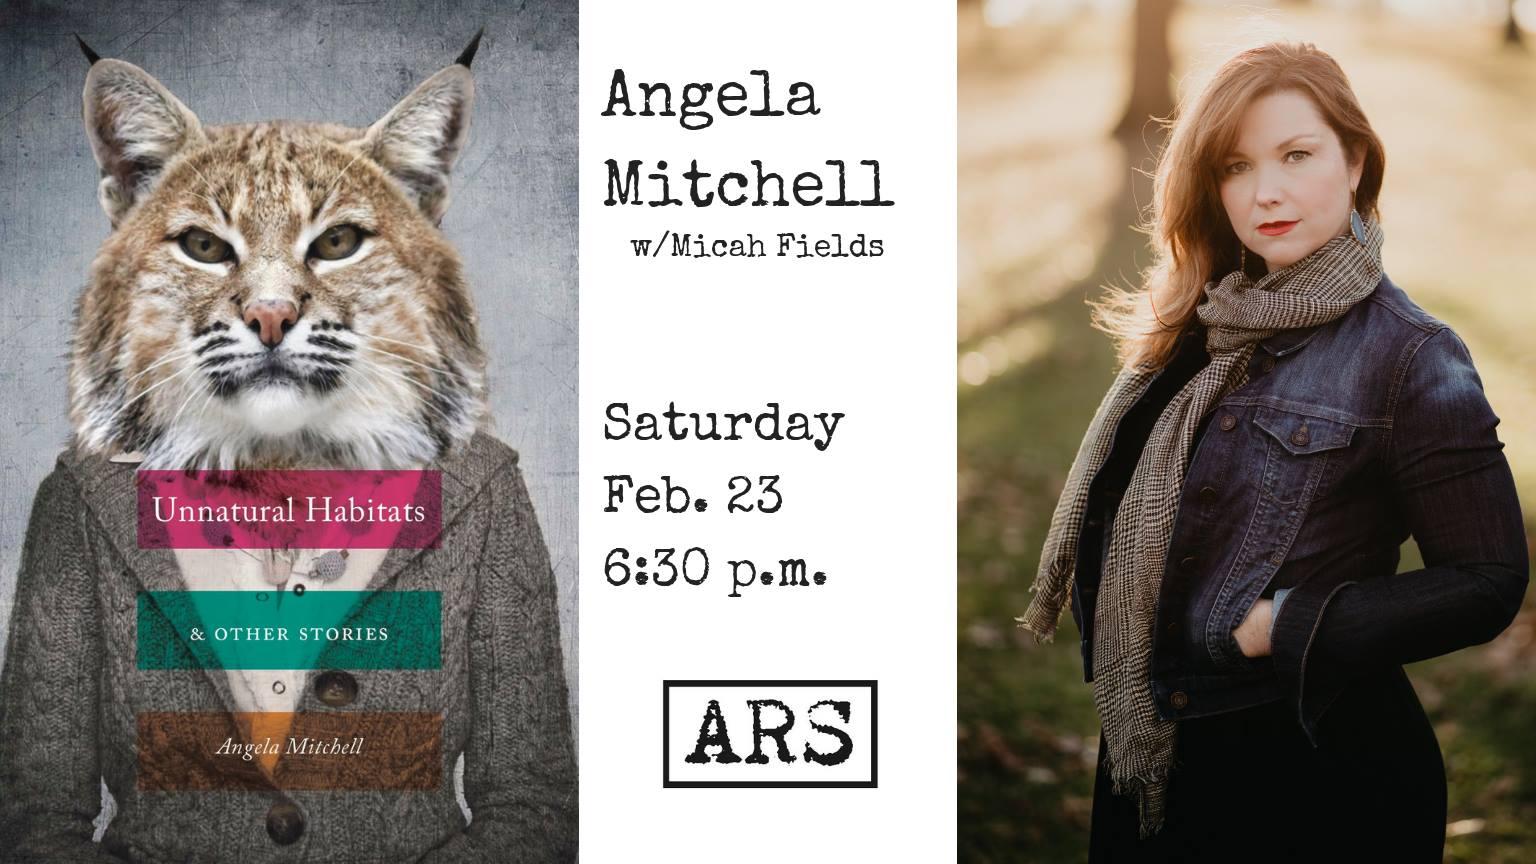 Angela Mitchell at Argenta Reading Series